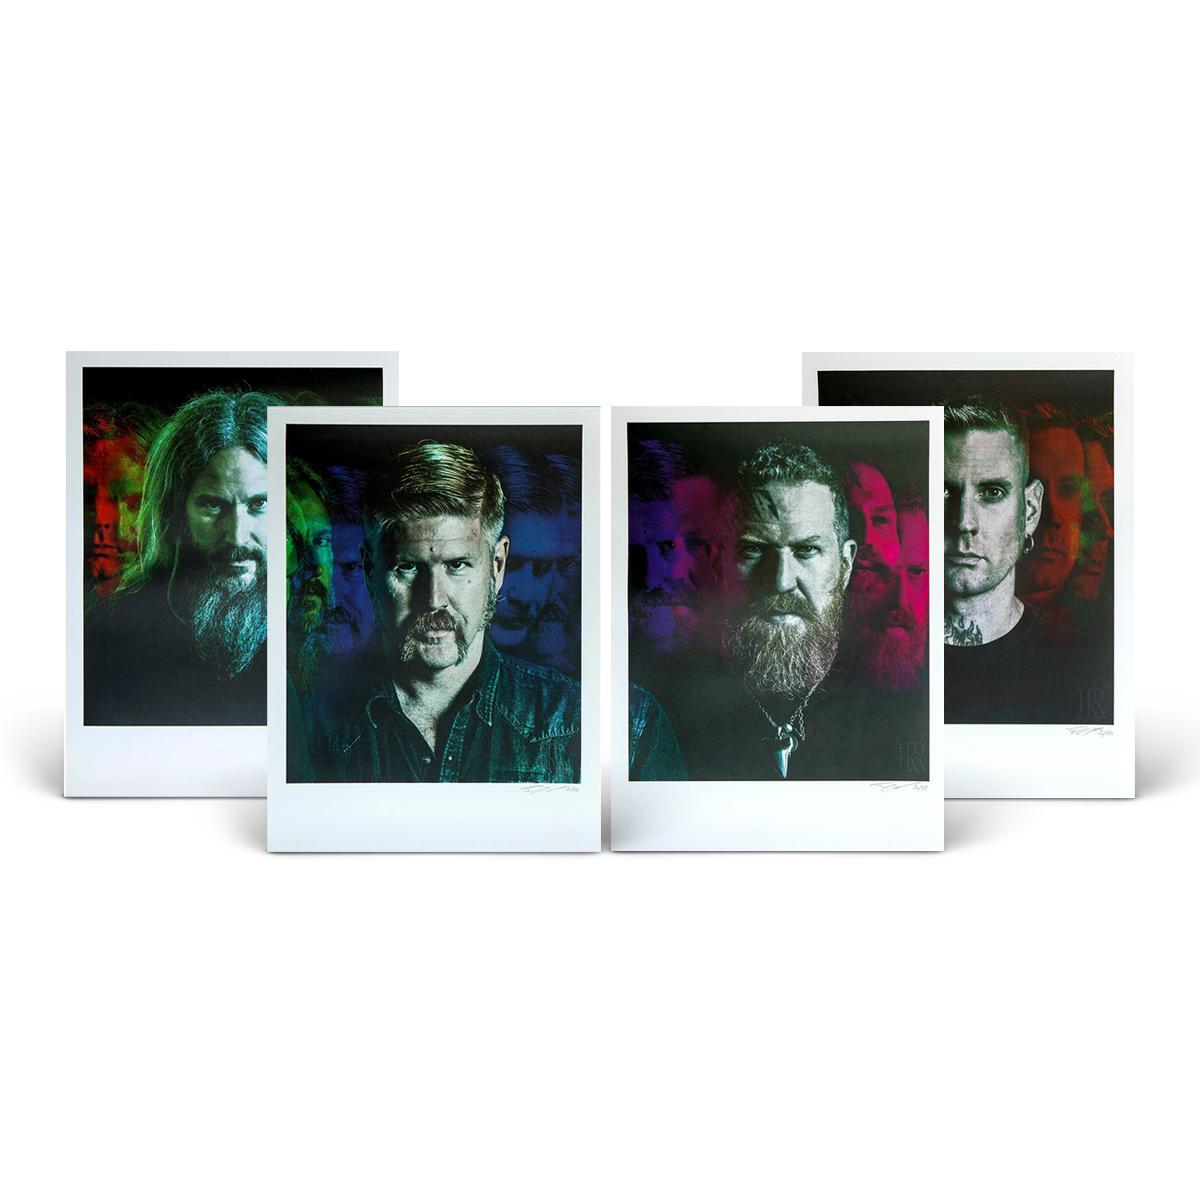 Collector's Edition 18 x 24 Mastodon Prints – 4 Print Set